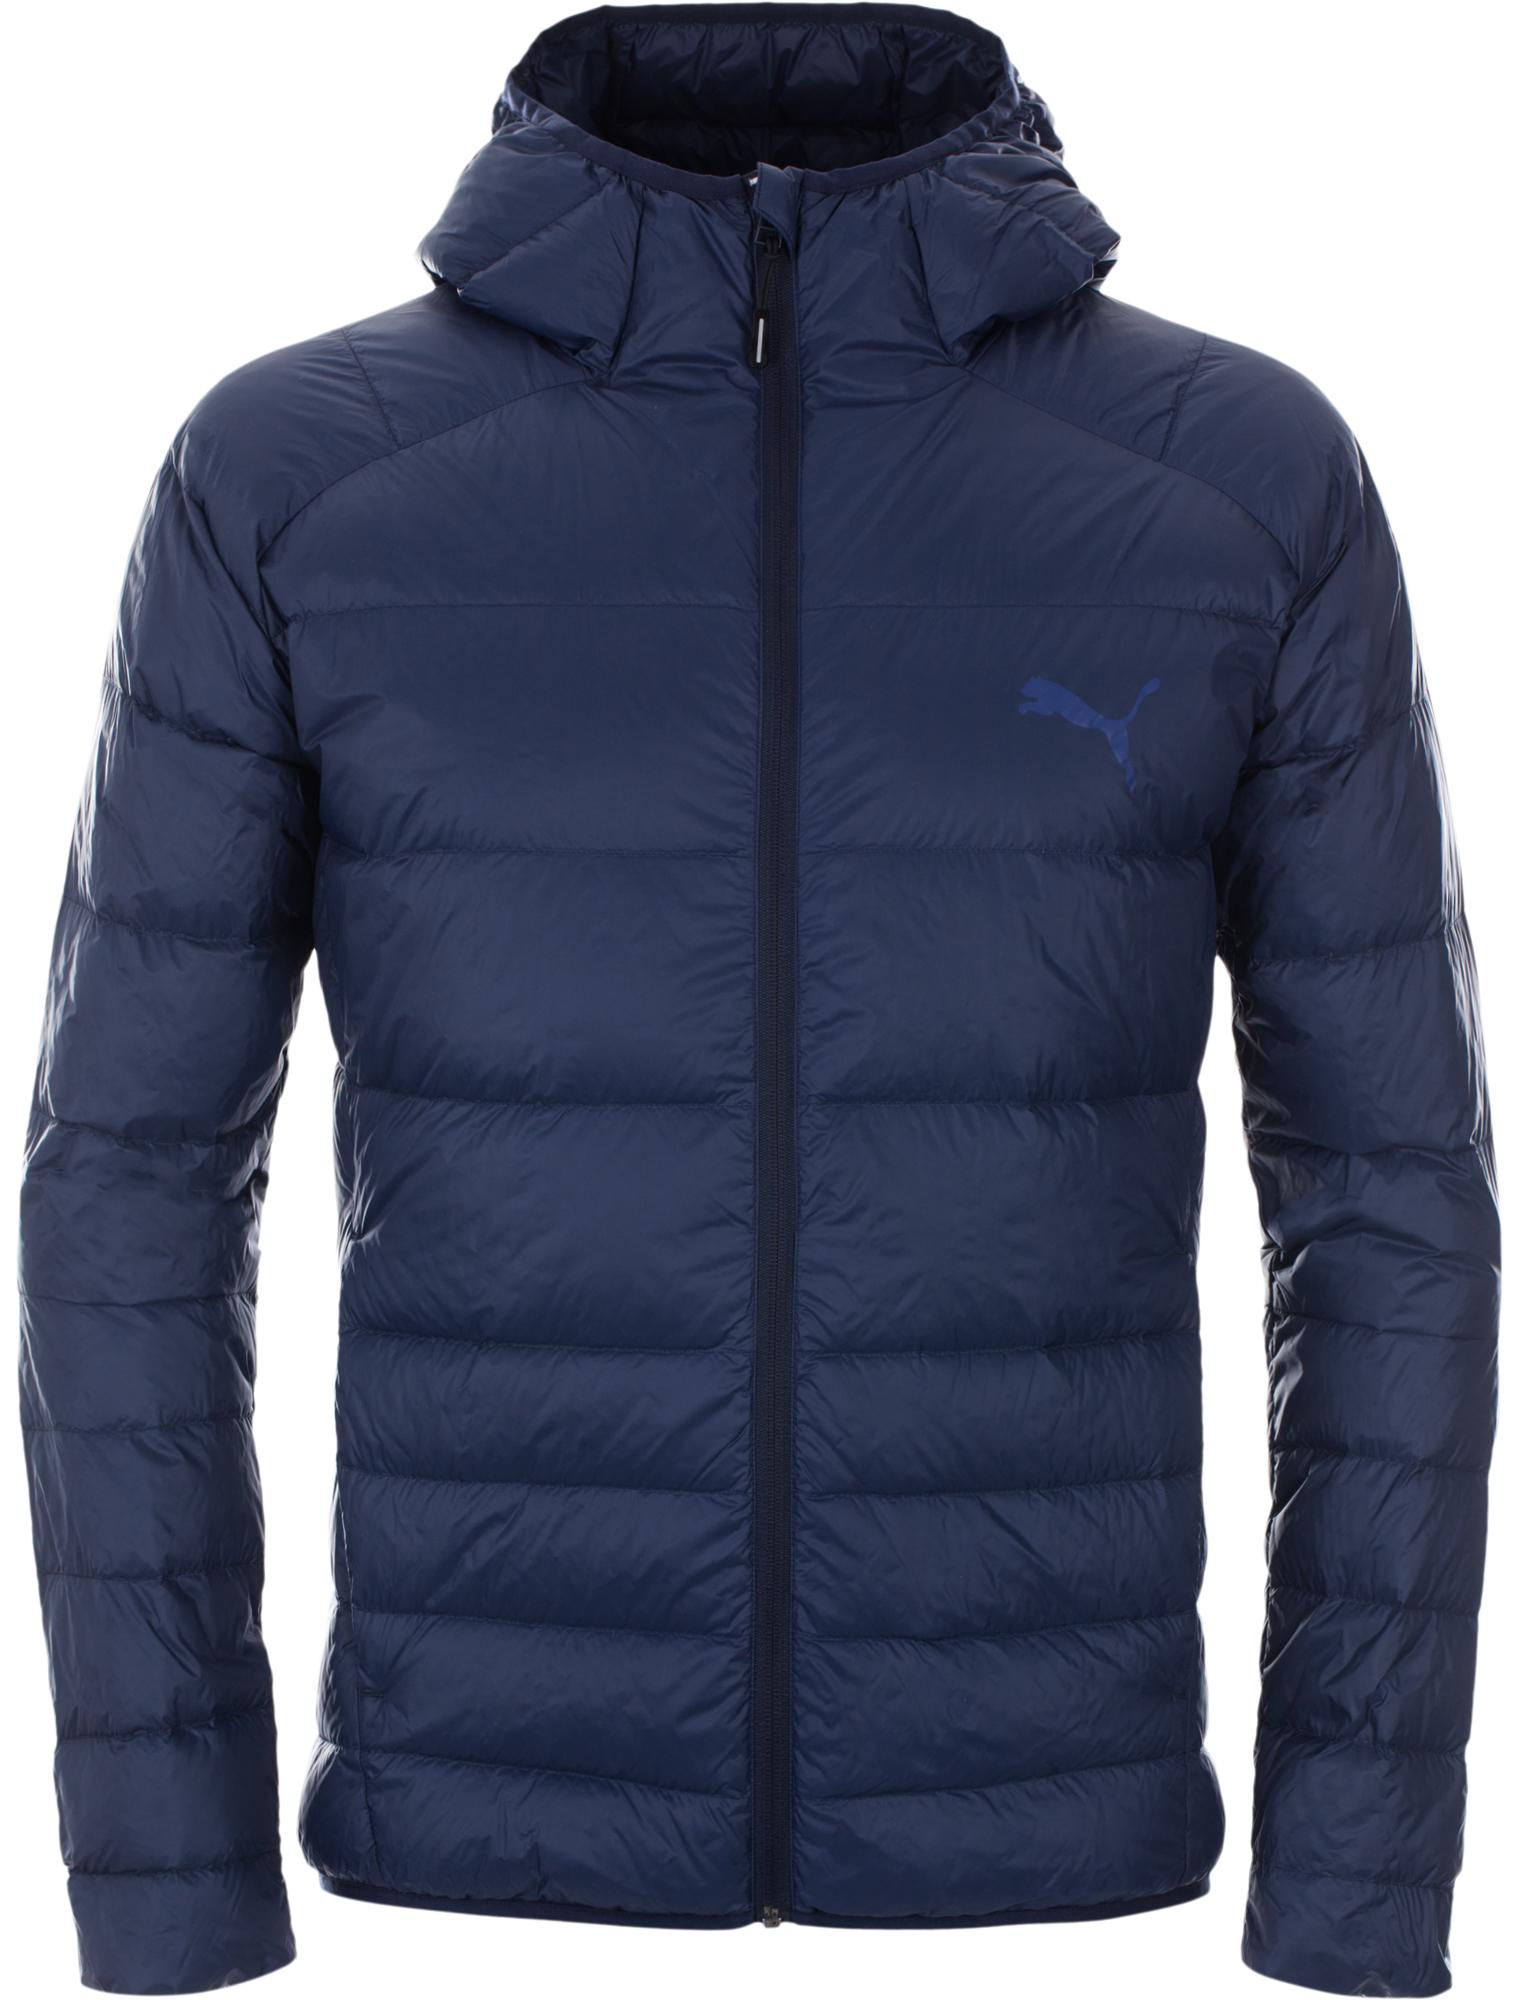 PUMA Куртка пуховая мужская Puma PWRWarm packLITE HD 600, размер 48-50 цена